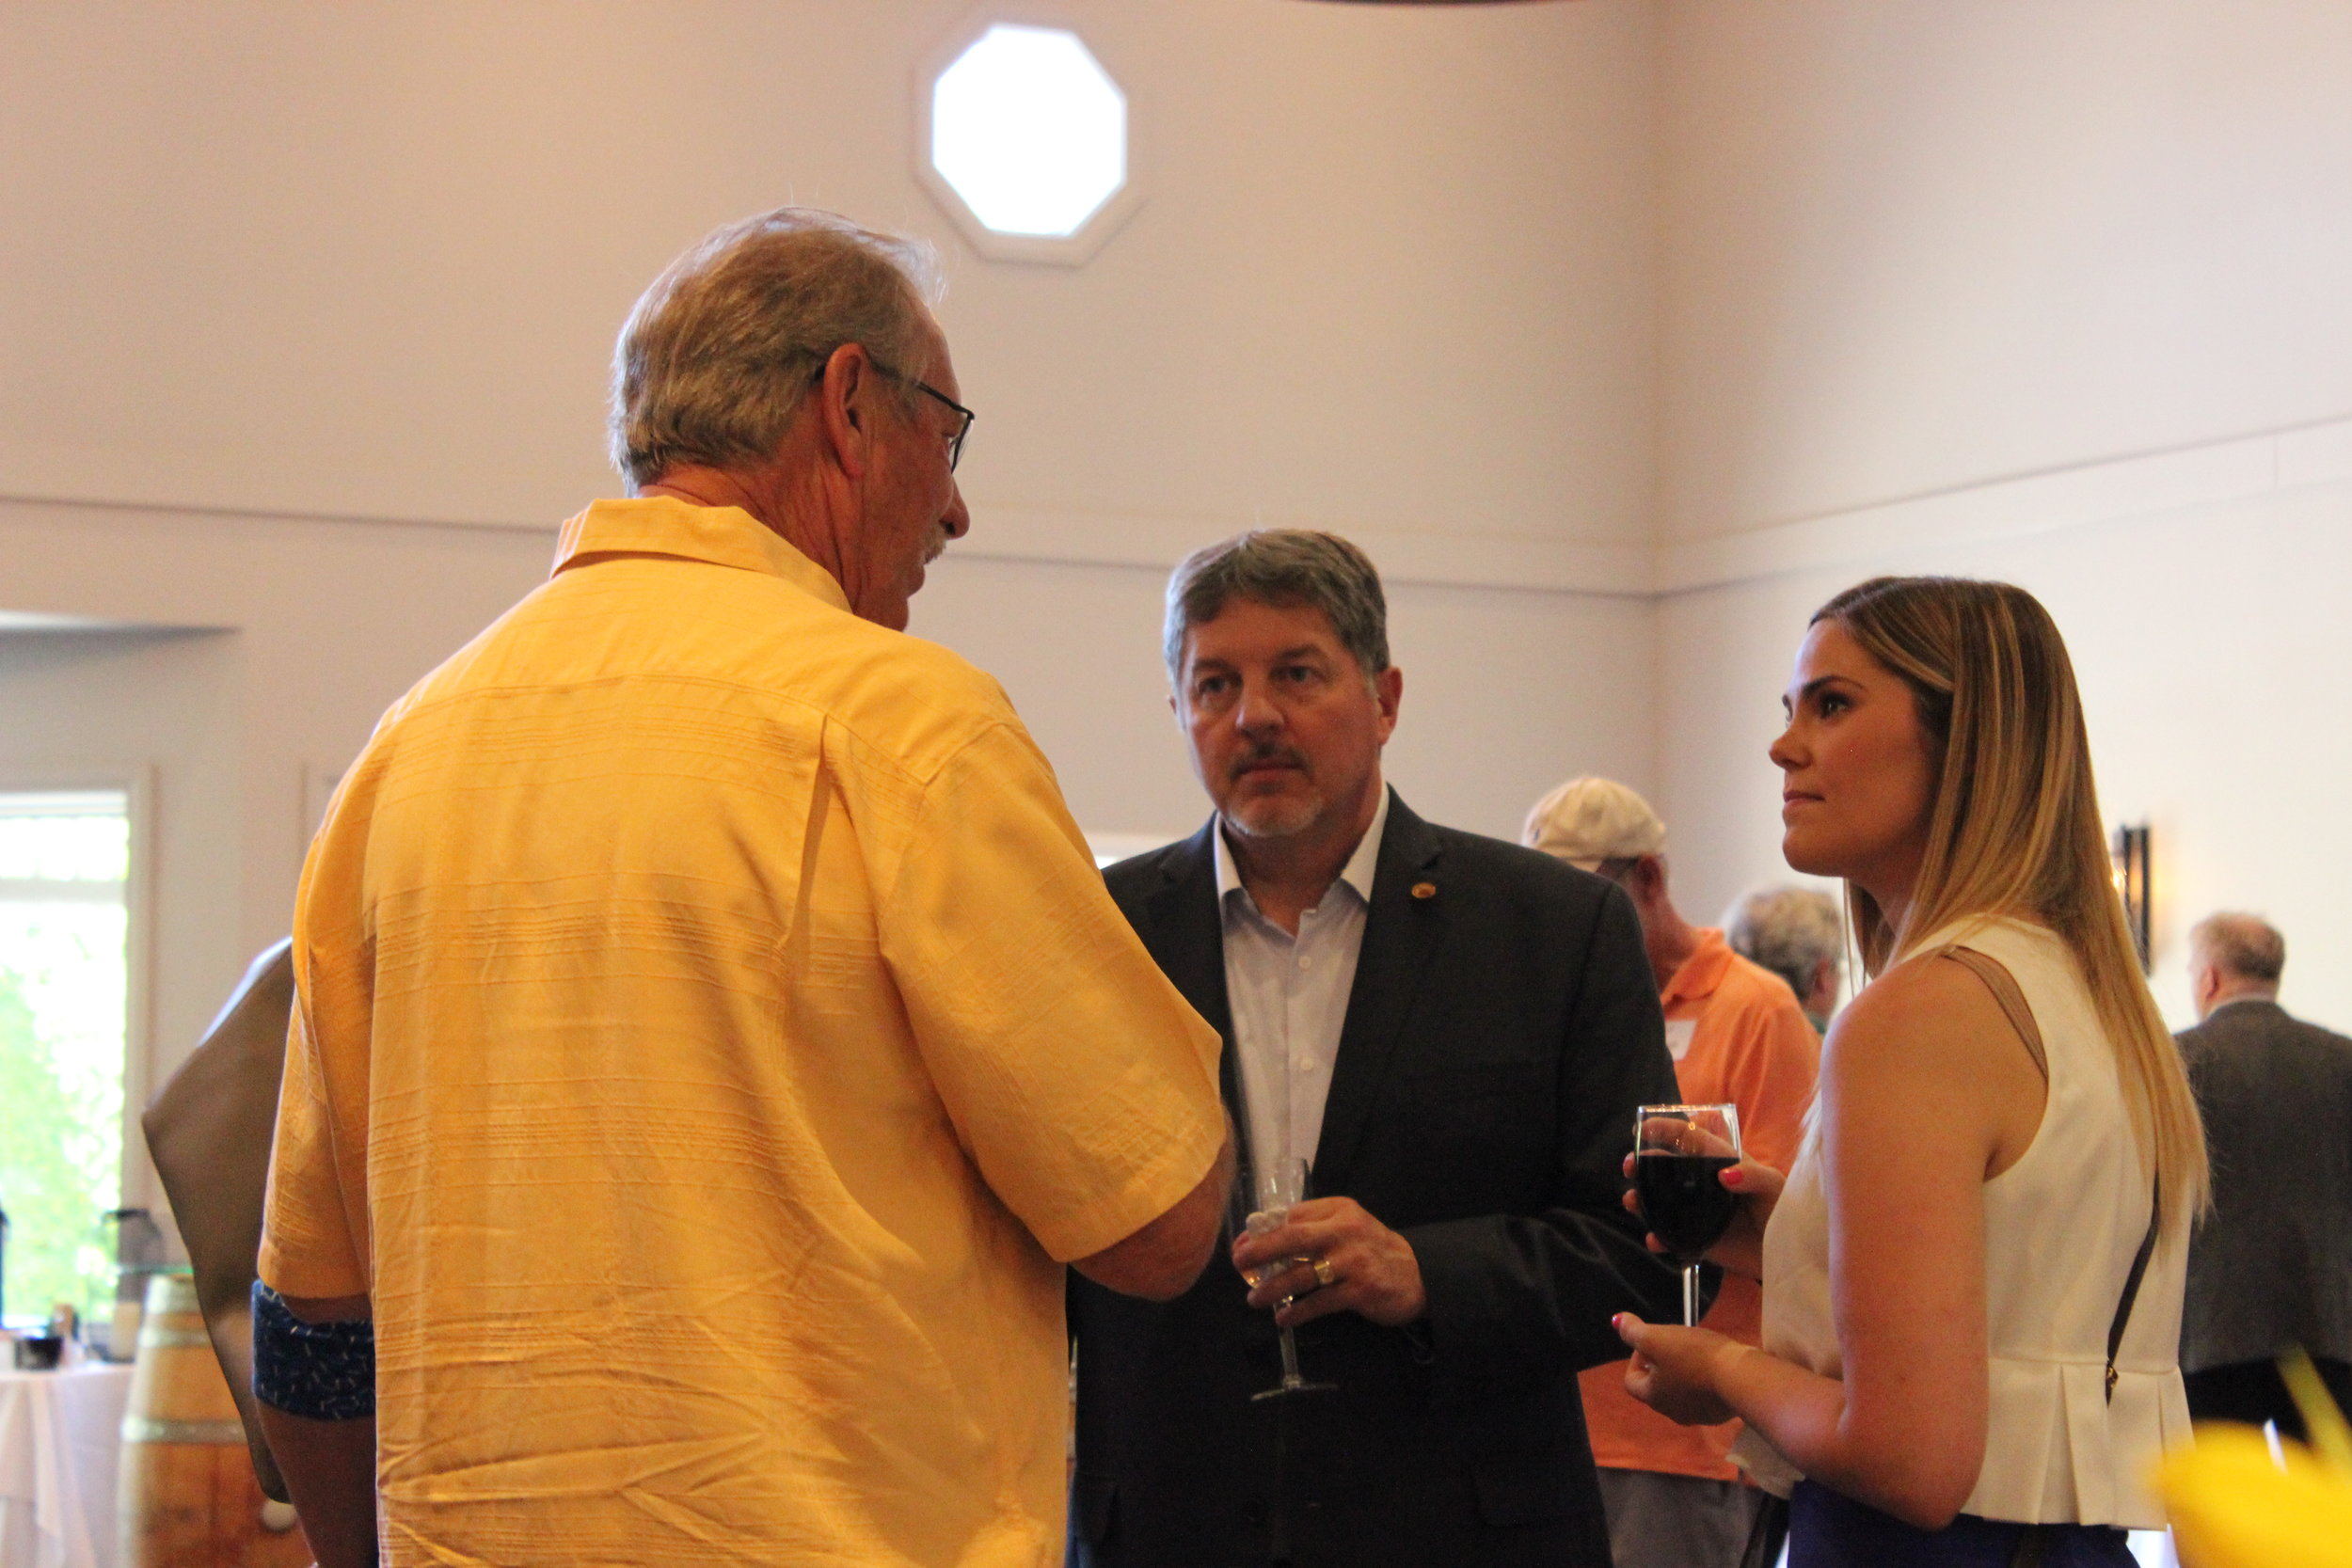 Wetherholt Principal, Bob Card, with guests